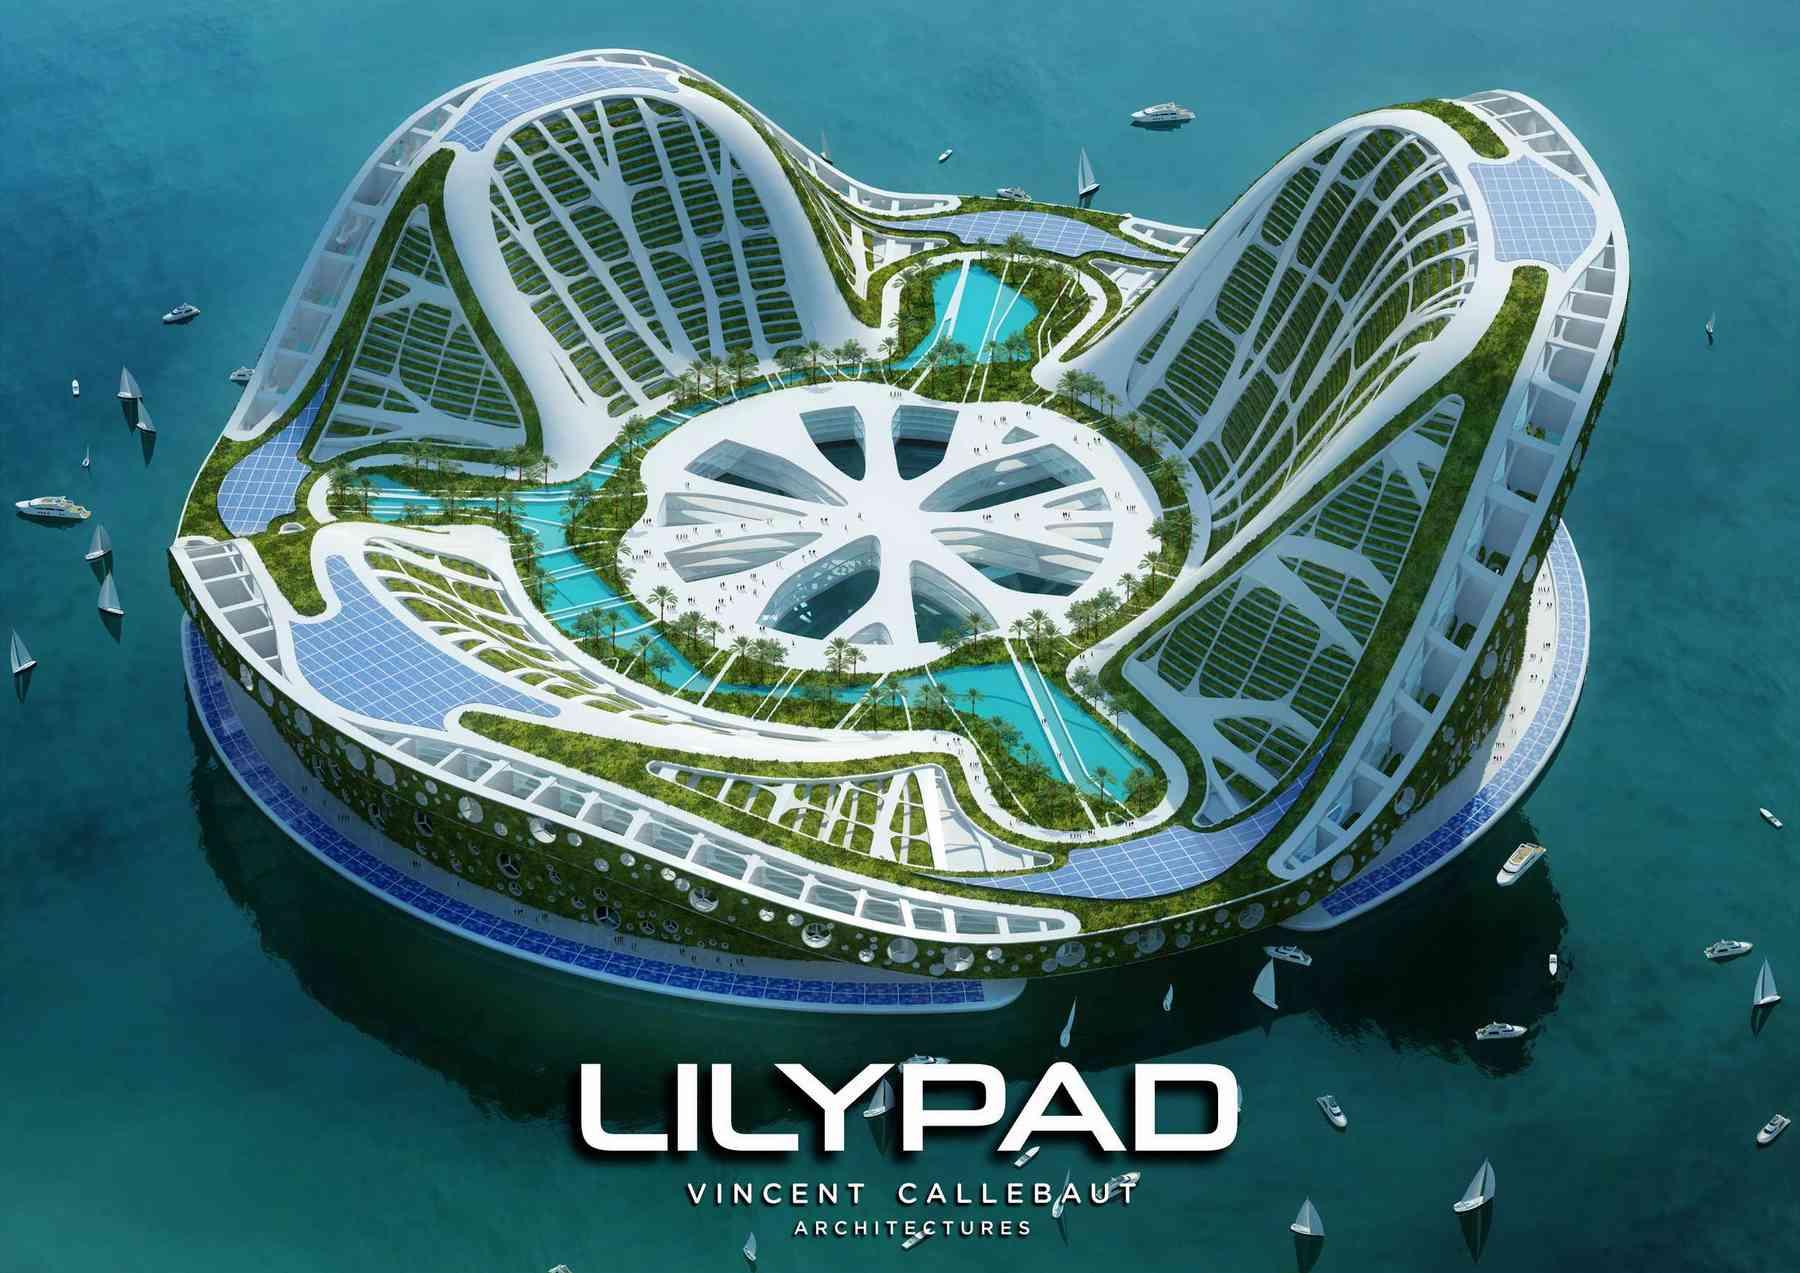 Crédit image: http://vincent.callebaut.org/object/080523_lilypad/lilypad/projects